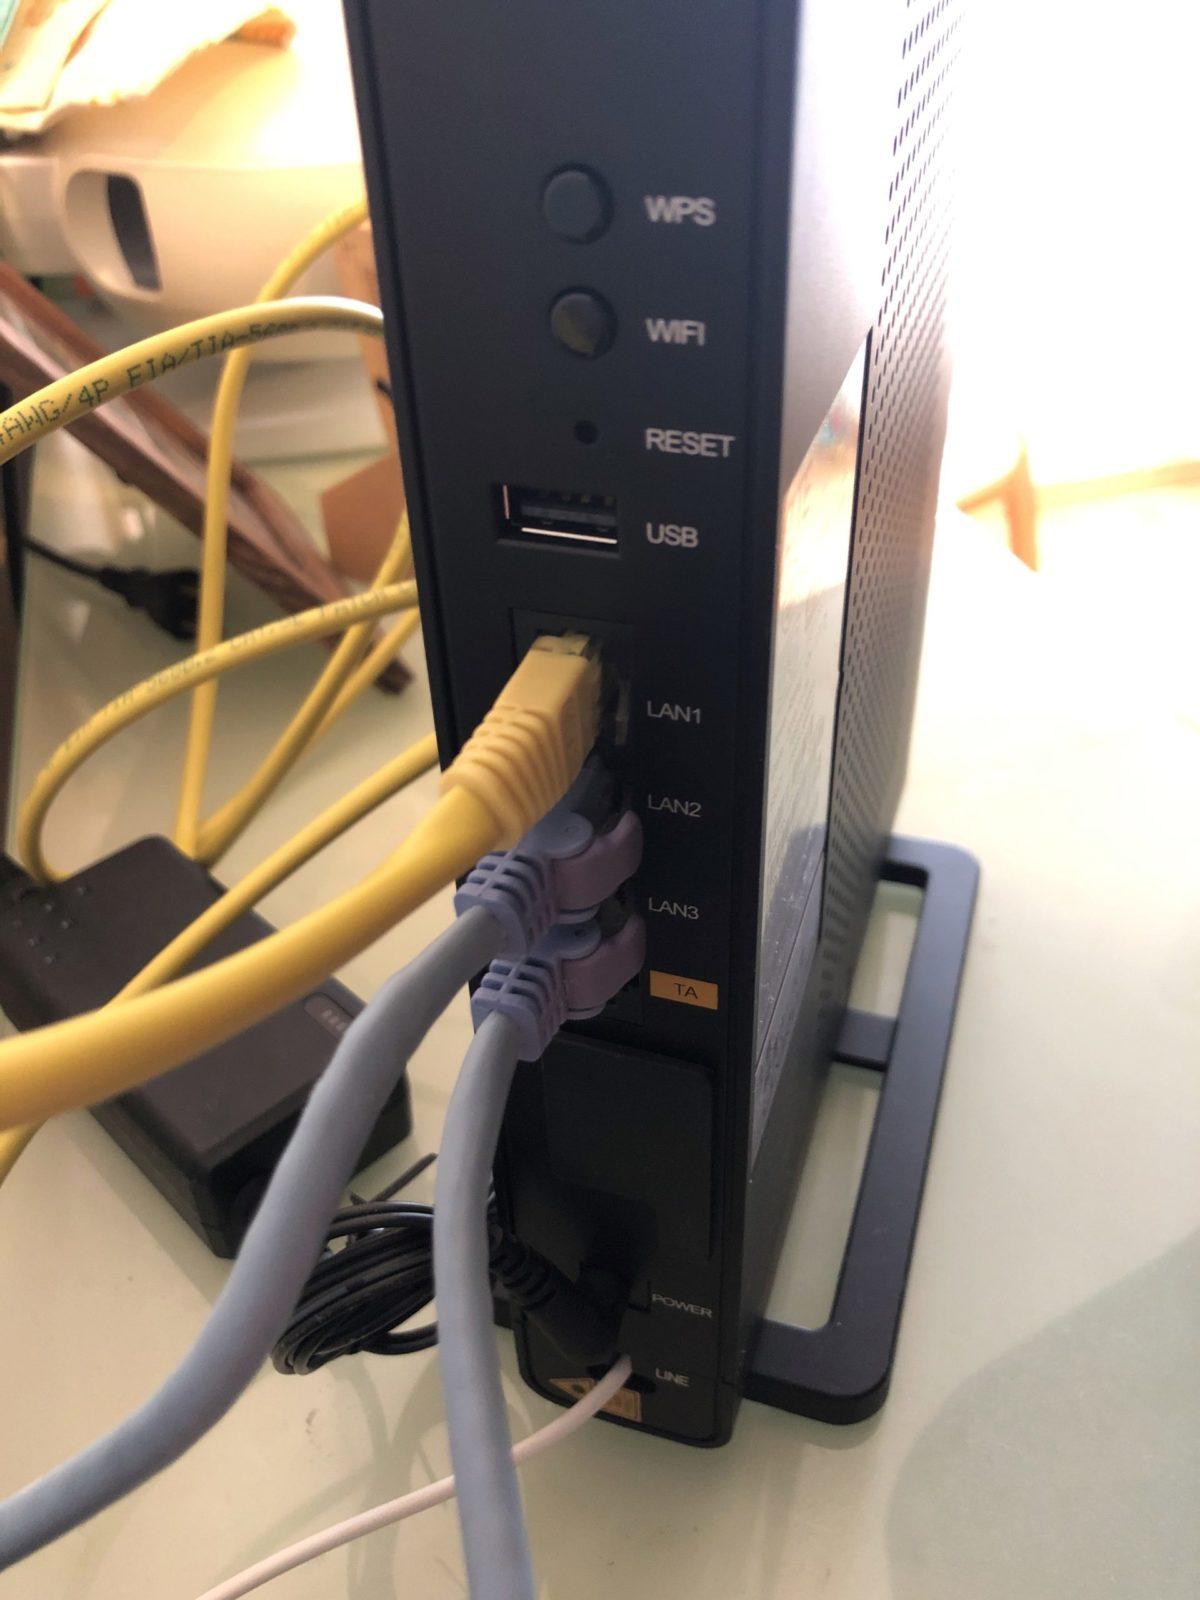 NURO光の光回線終端装置(ONU)。ZTE社のF660Aです。無線ルーターとしても利用可能。LANポートは3つあります。USB2.0ポートが一つ